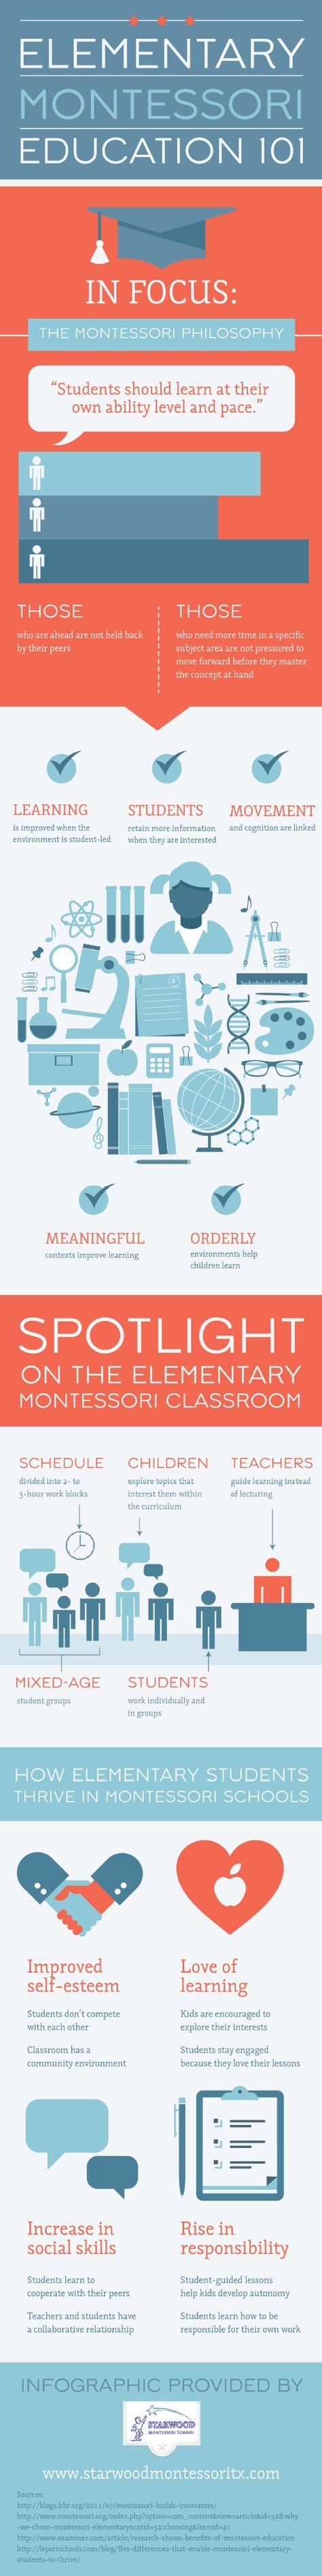 infographic Why Montessori Elementary